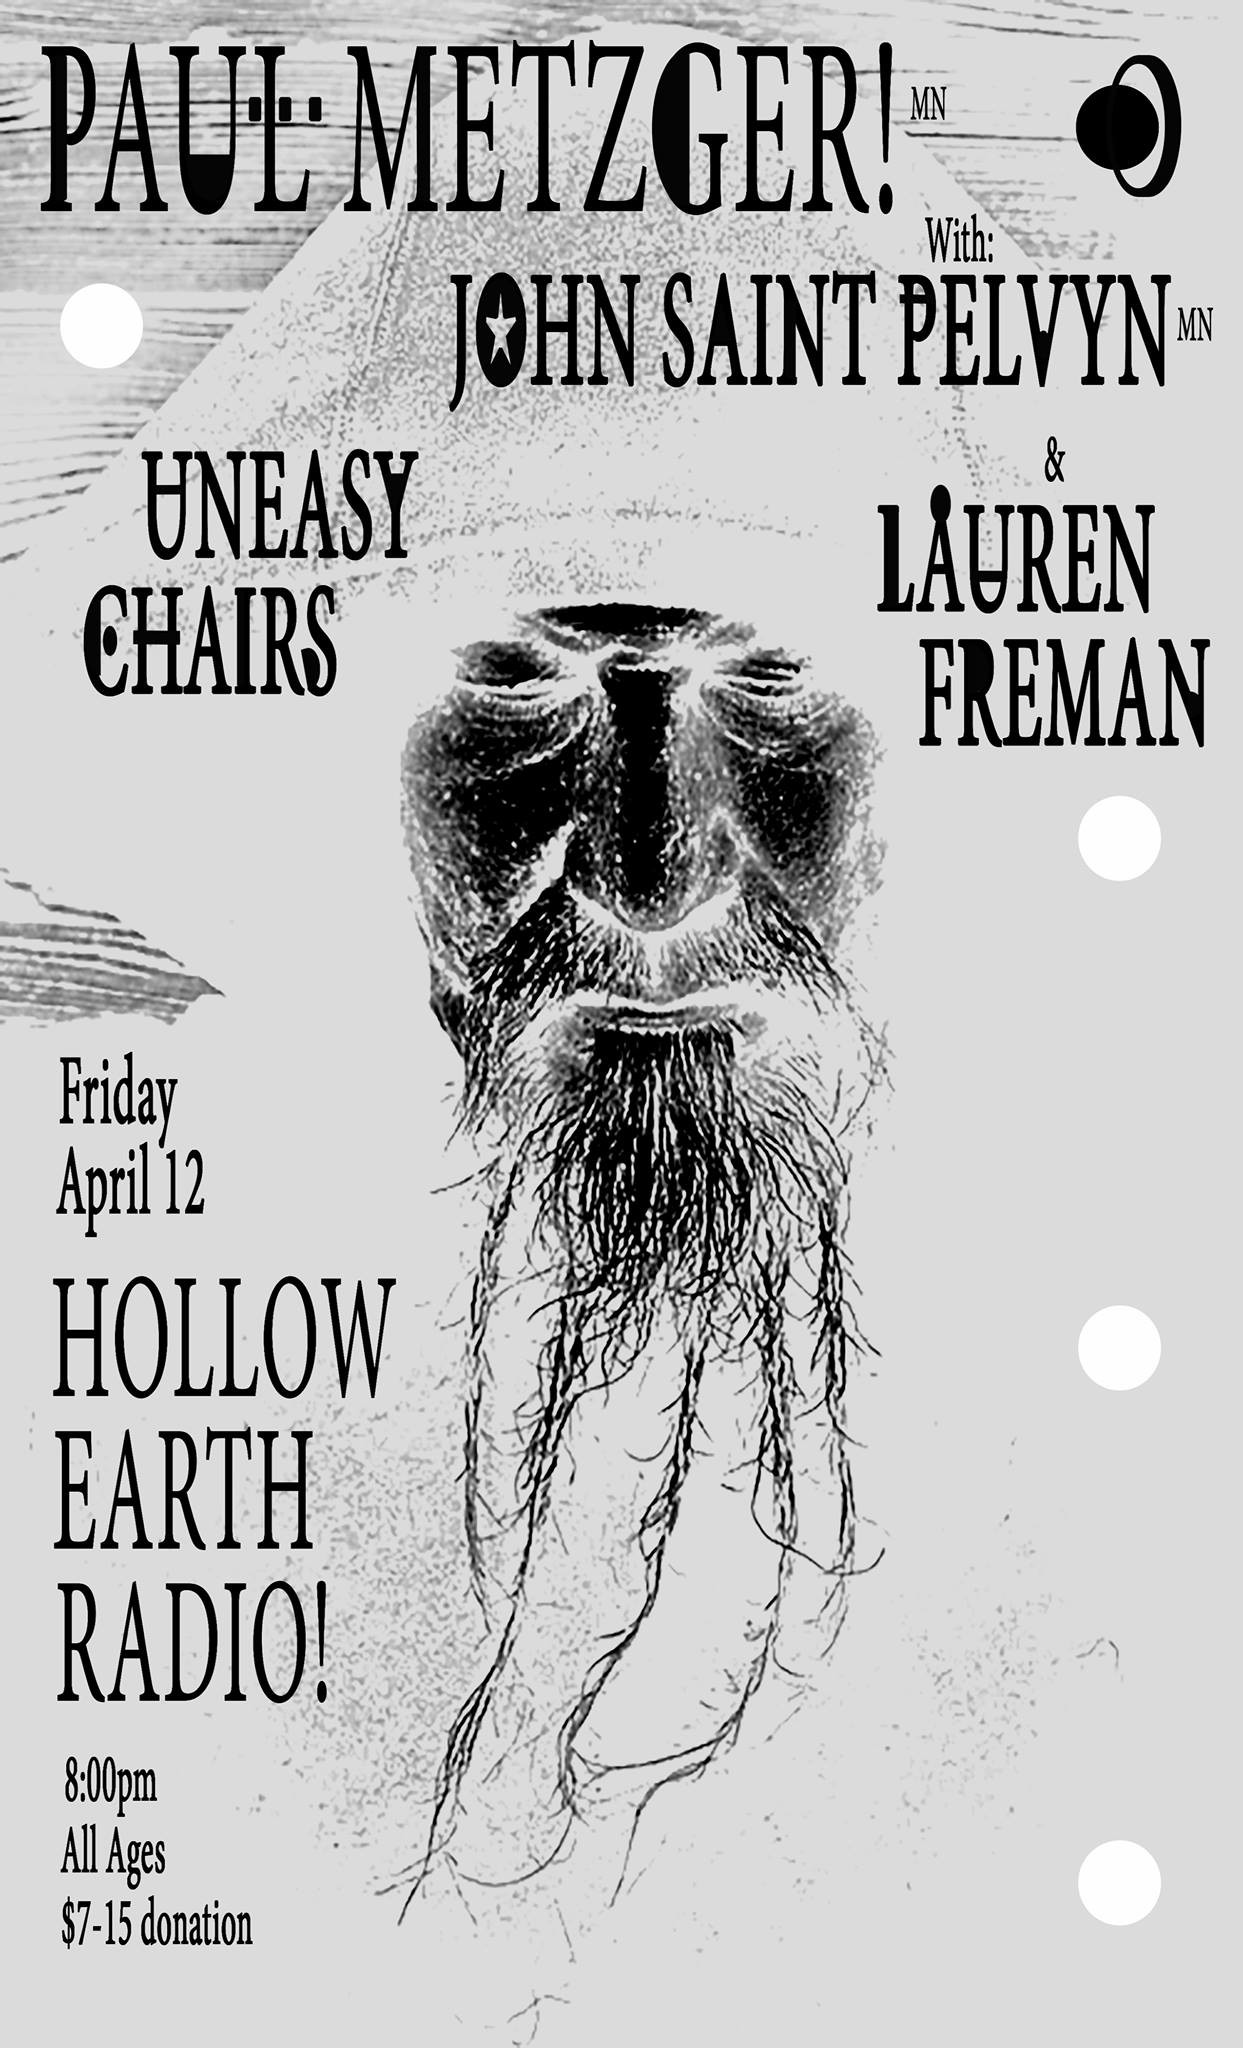 Paul Metzger, John Saint Pelyvn, Uneasy Chairs, Lauren Freman